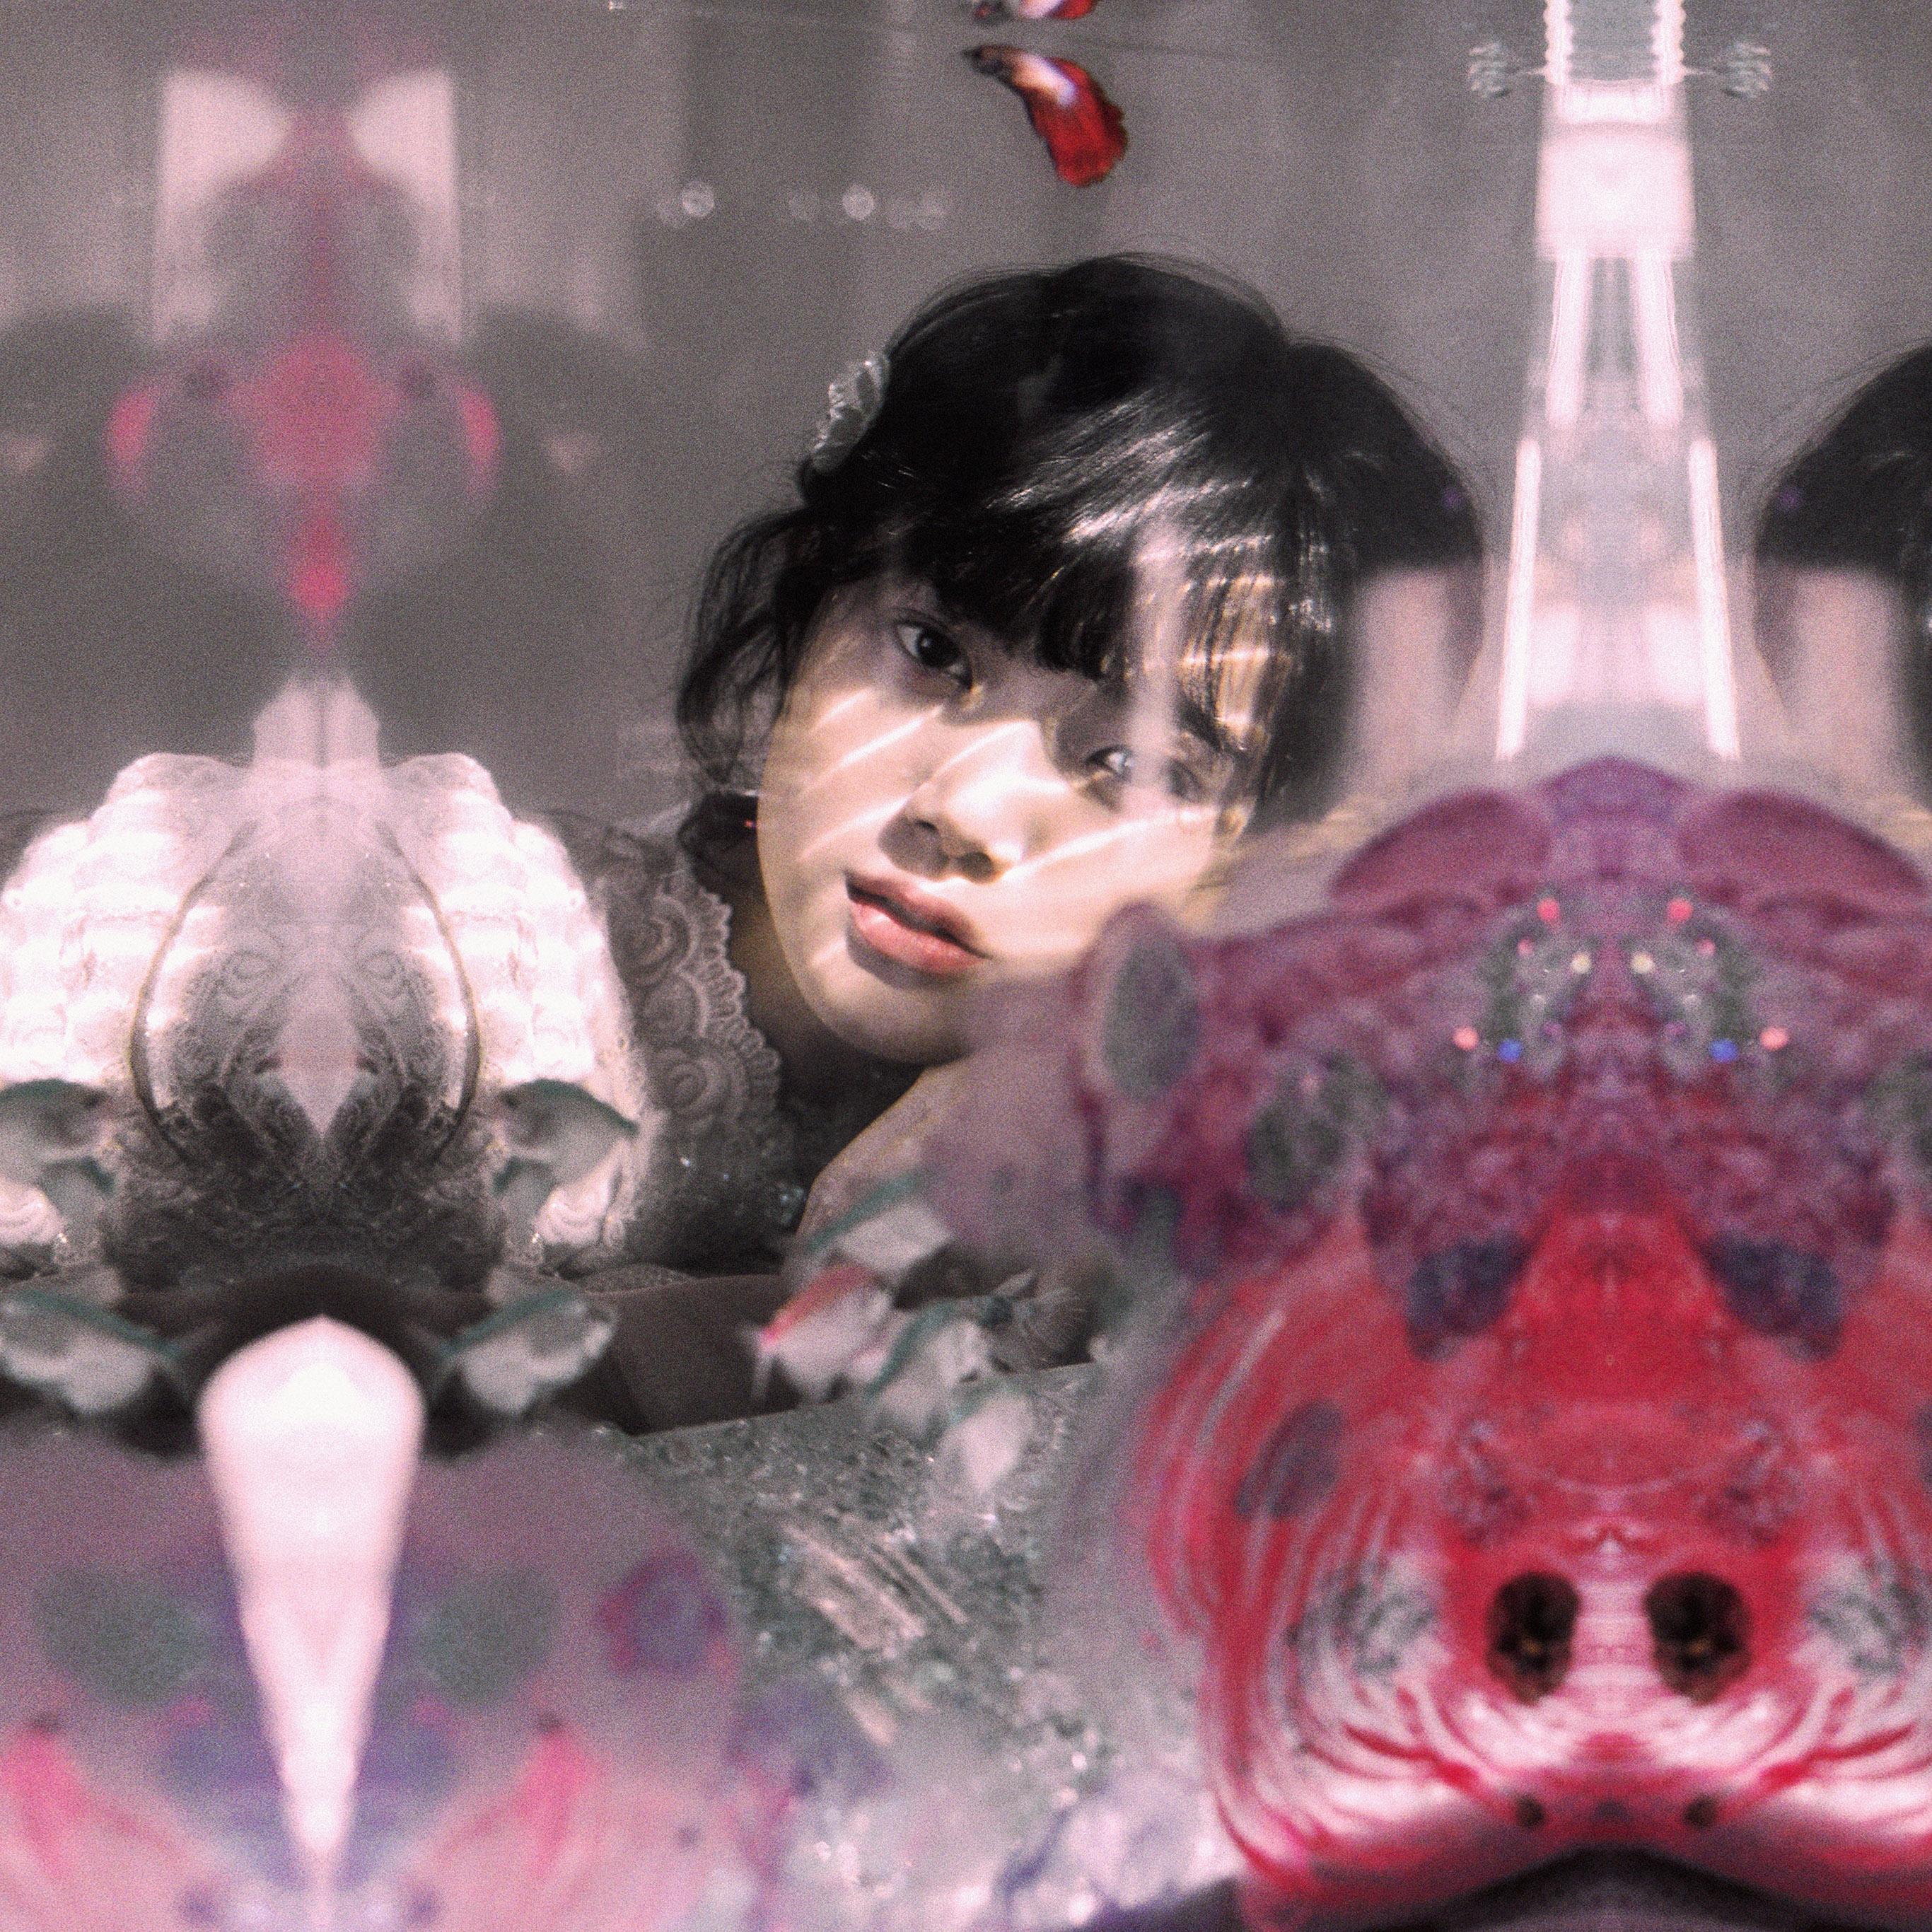 Hq36 Girl Asian Red Kpop Wallpaper